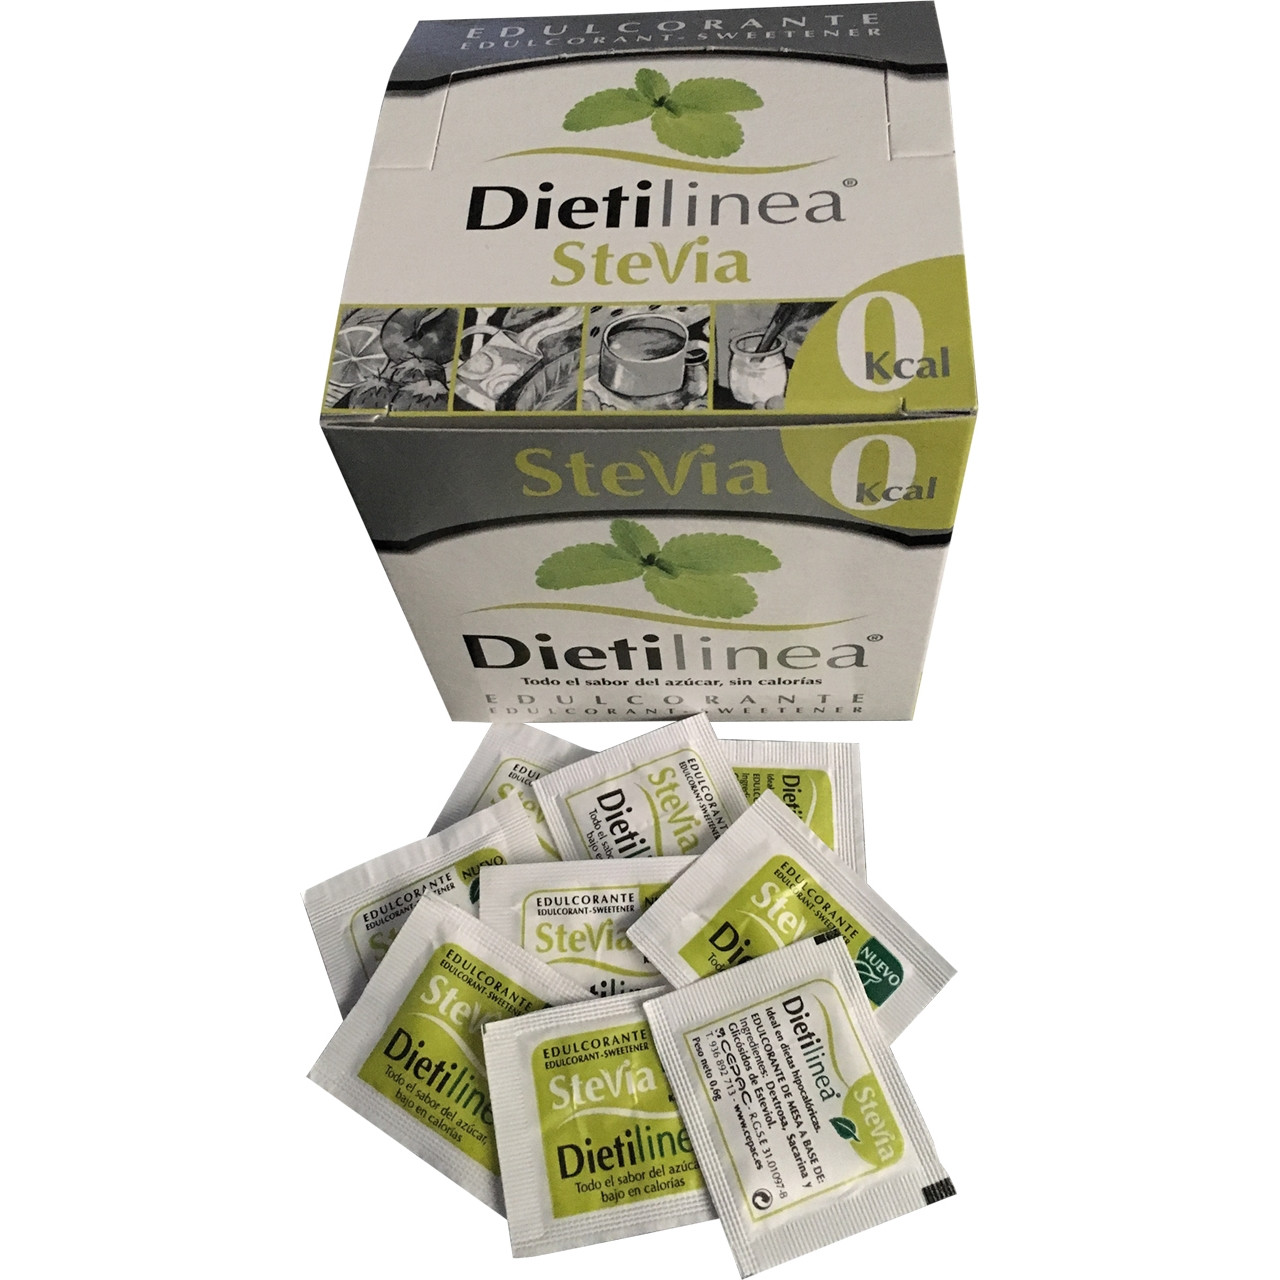 Edulcorant Dietilinea stevia 0kcal